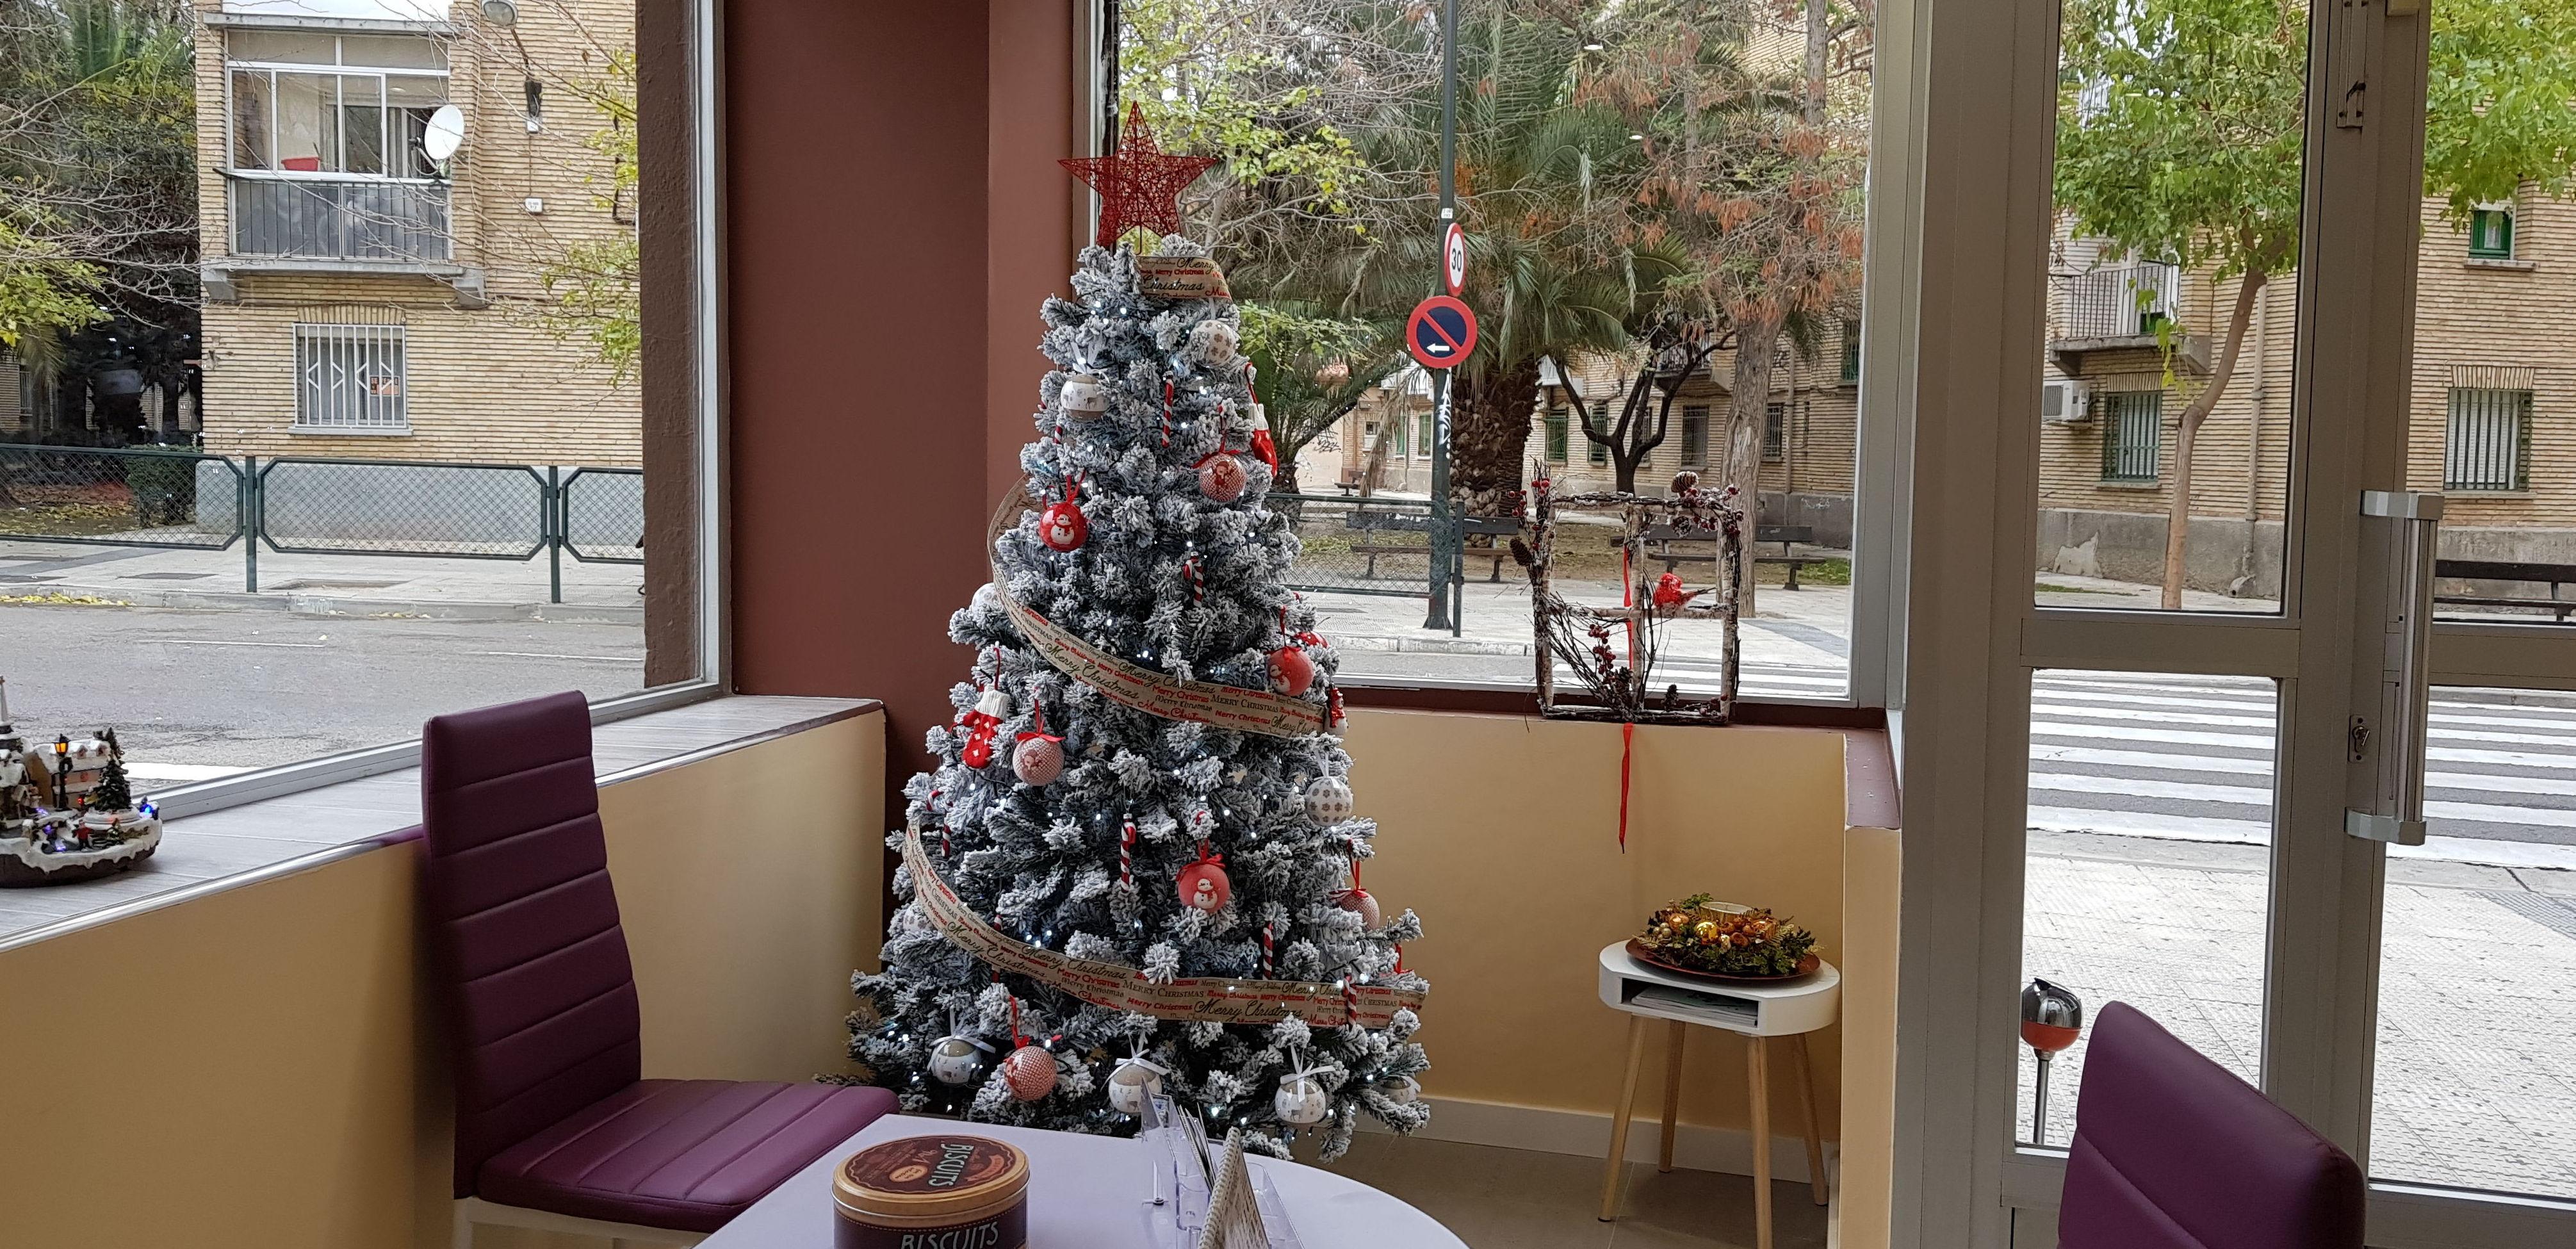 Academia de estudios Zaragoza